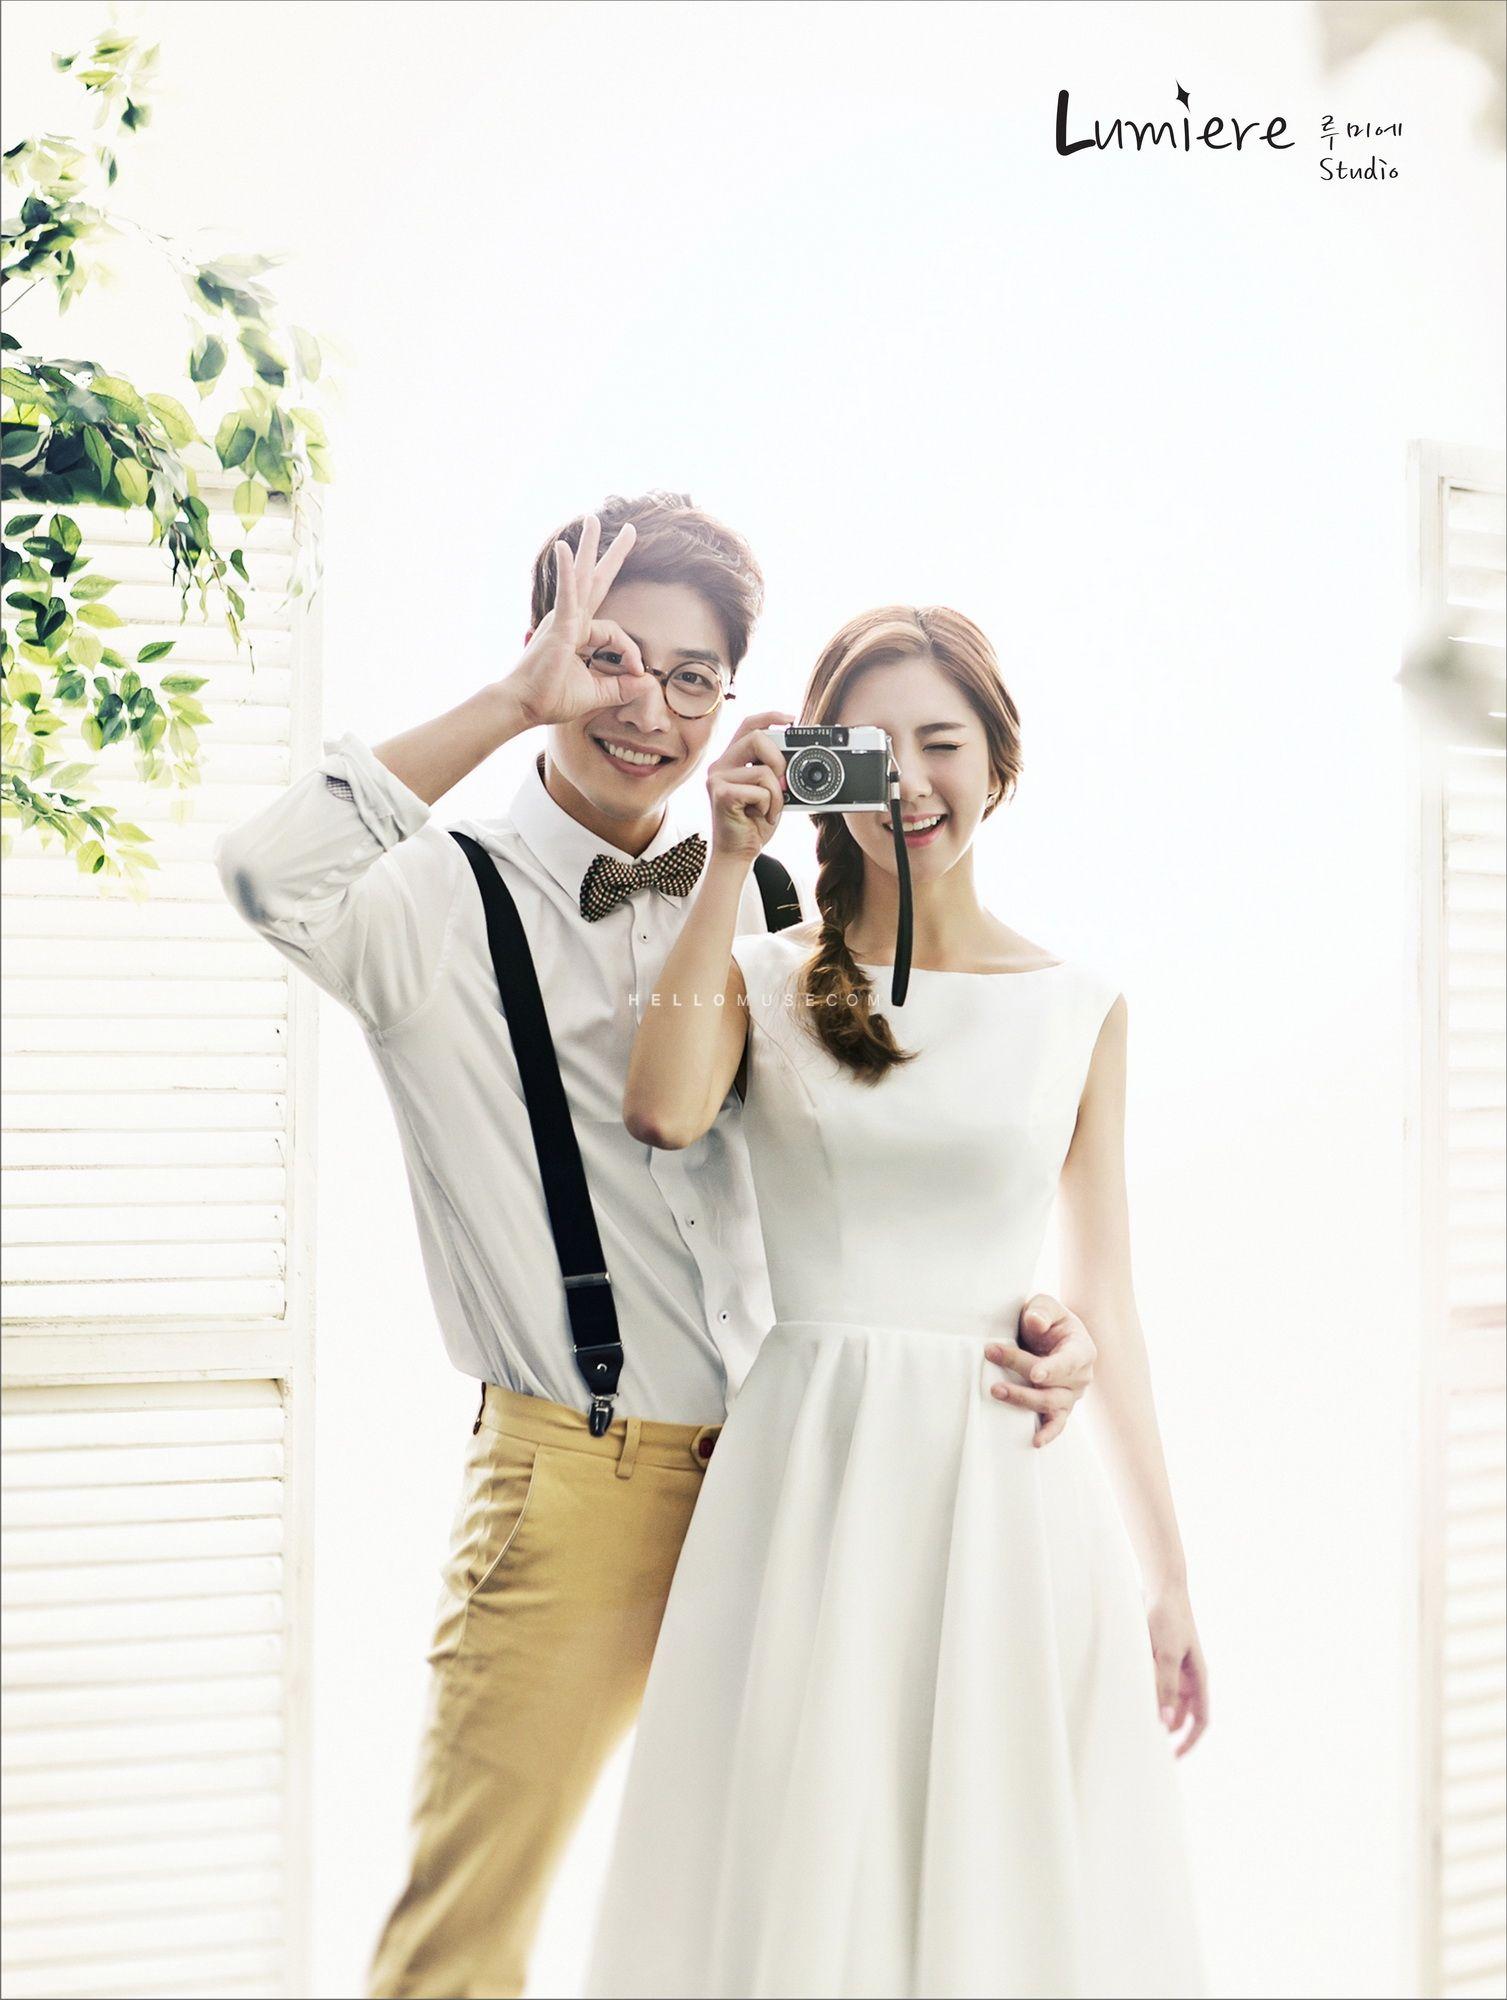 40+ Korean Romantic Pre-Wedding Theme Photoshoot Ideas | Pinterest ...